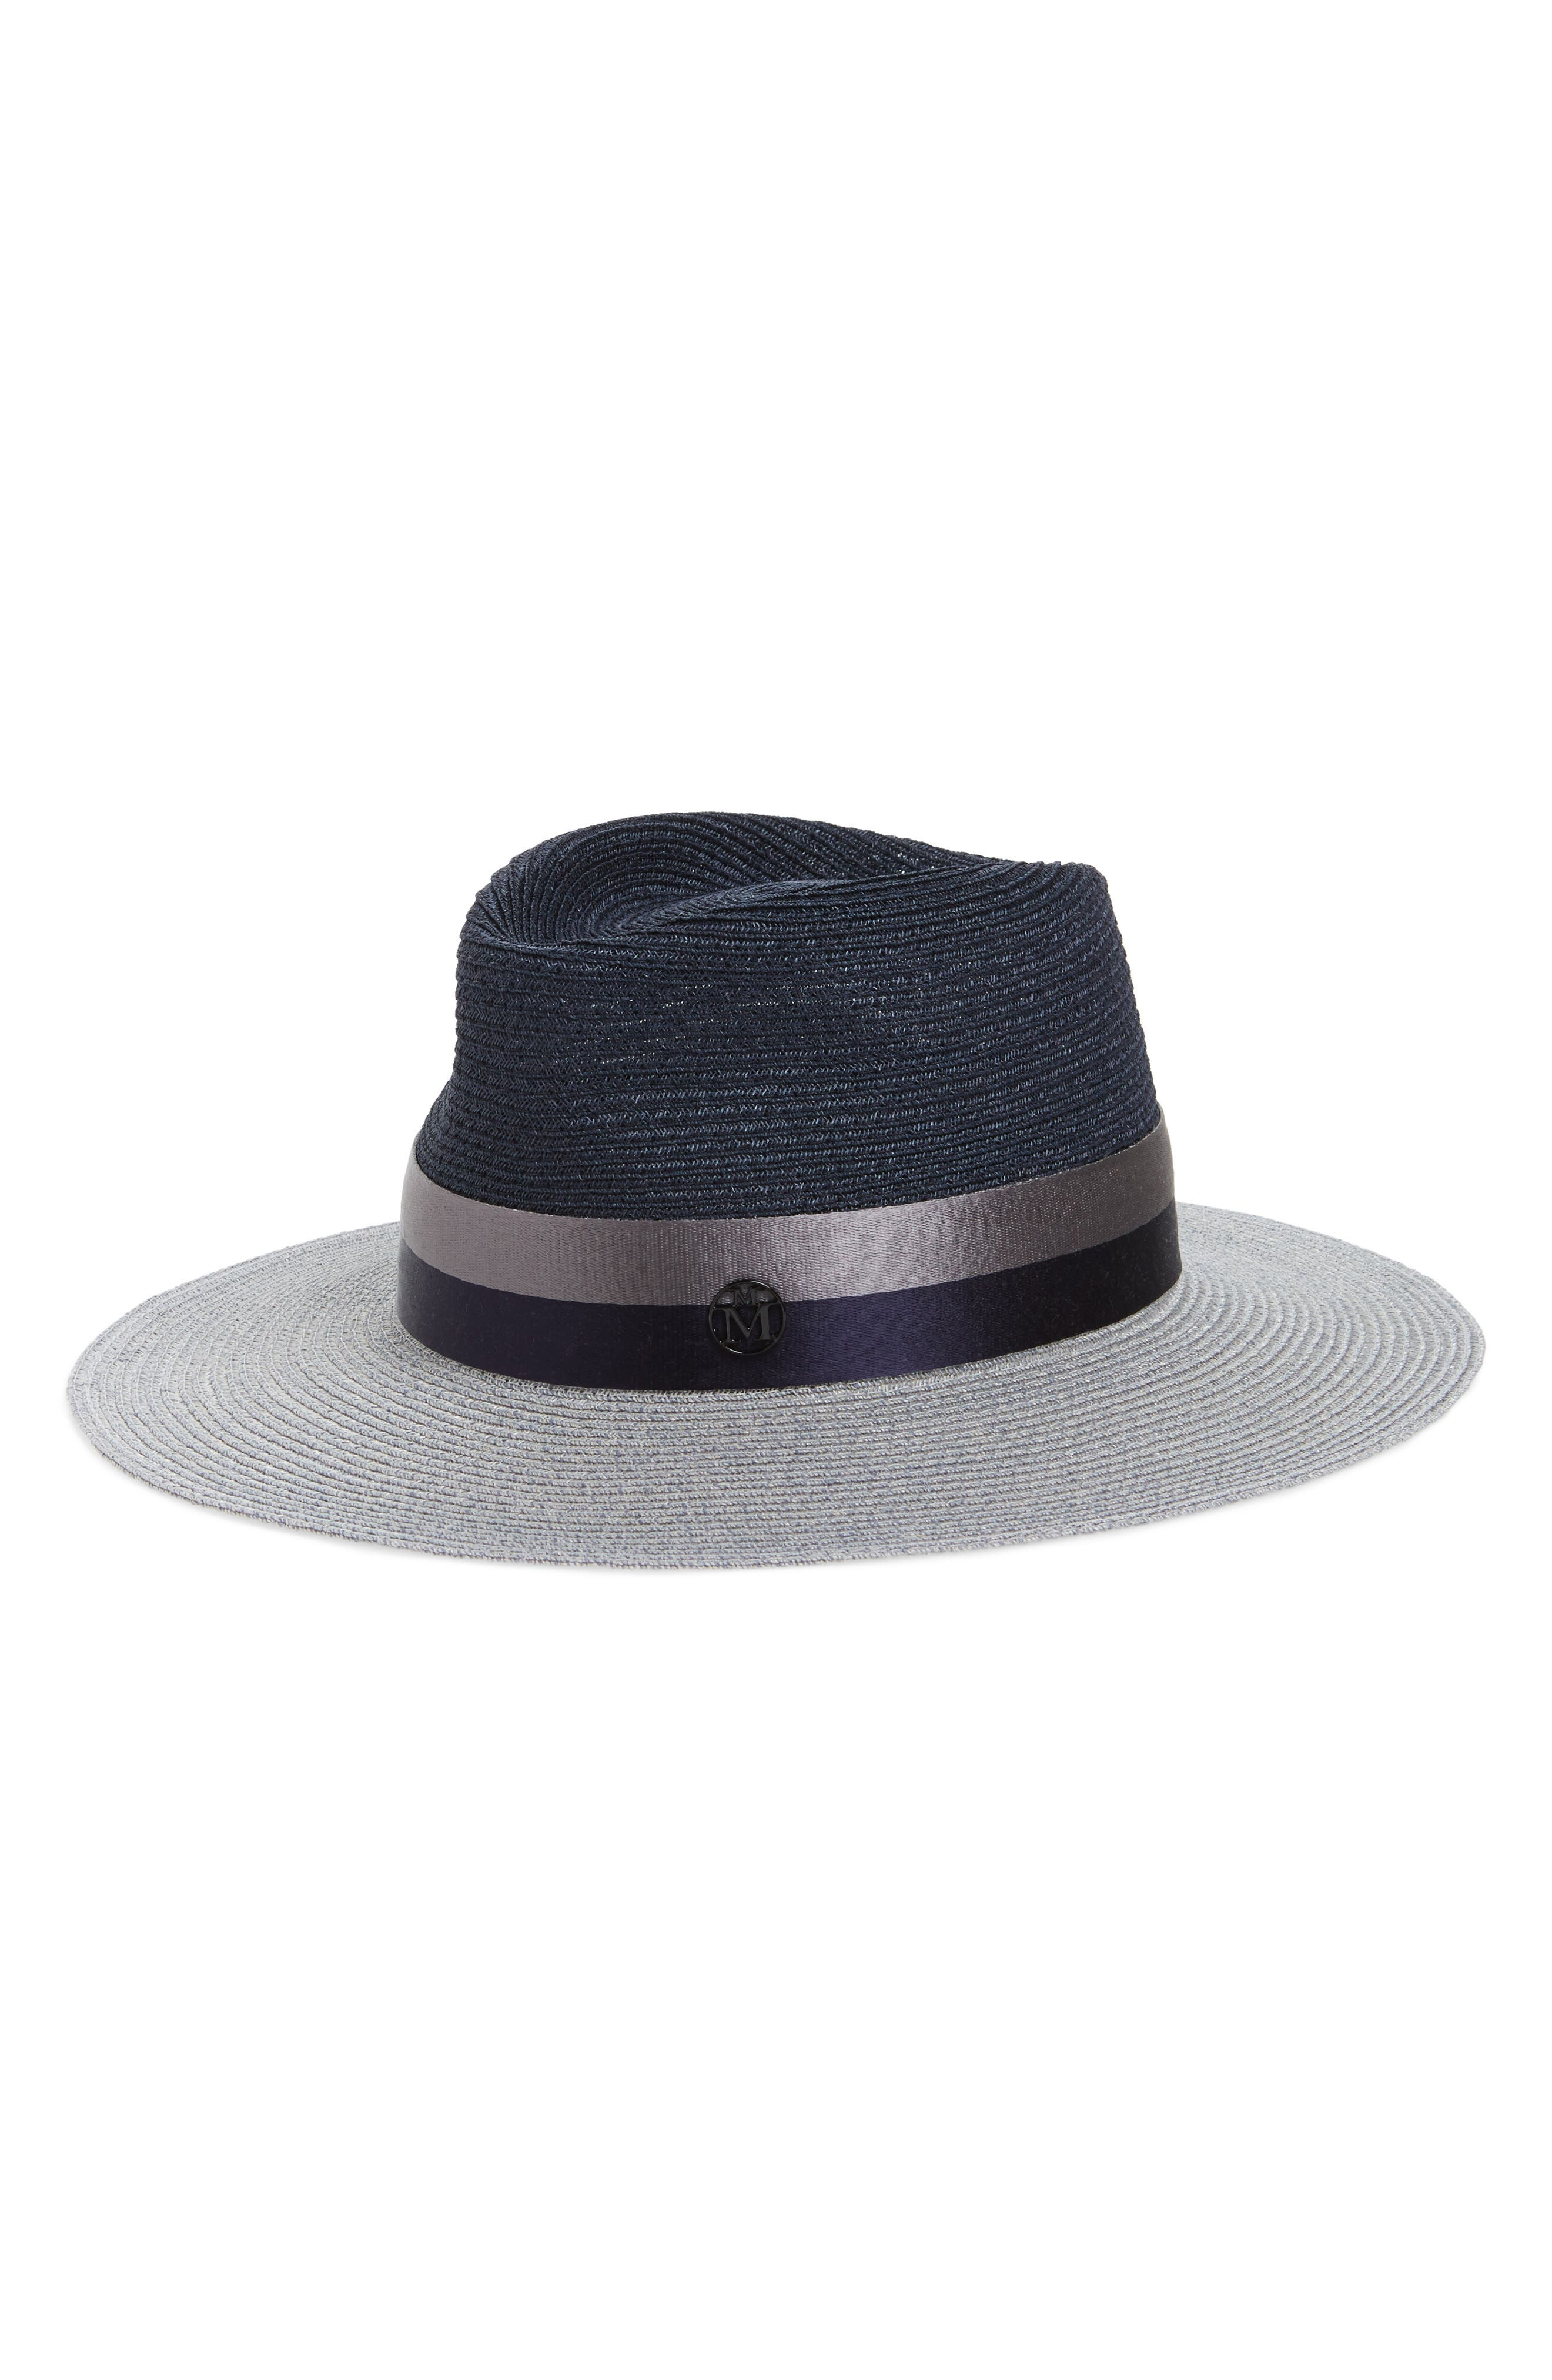 Virginie Fur Felt Hat,                         Main,                         color,